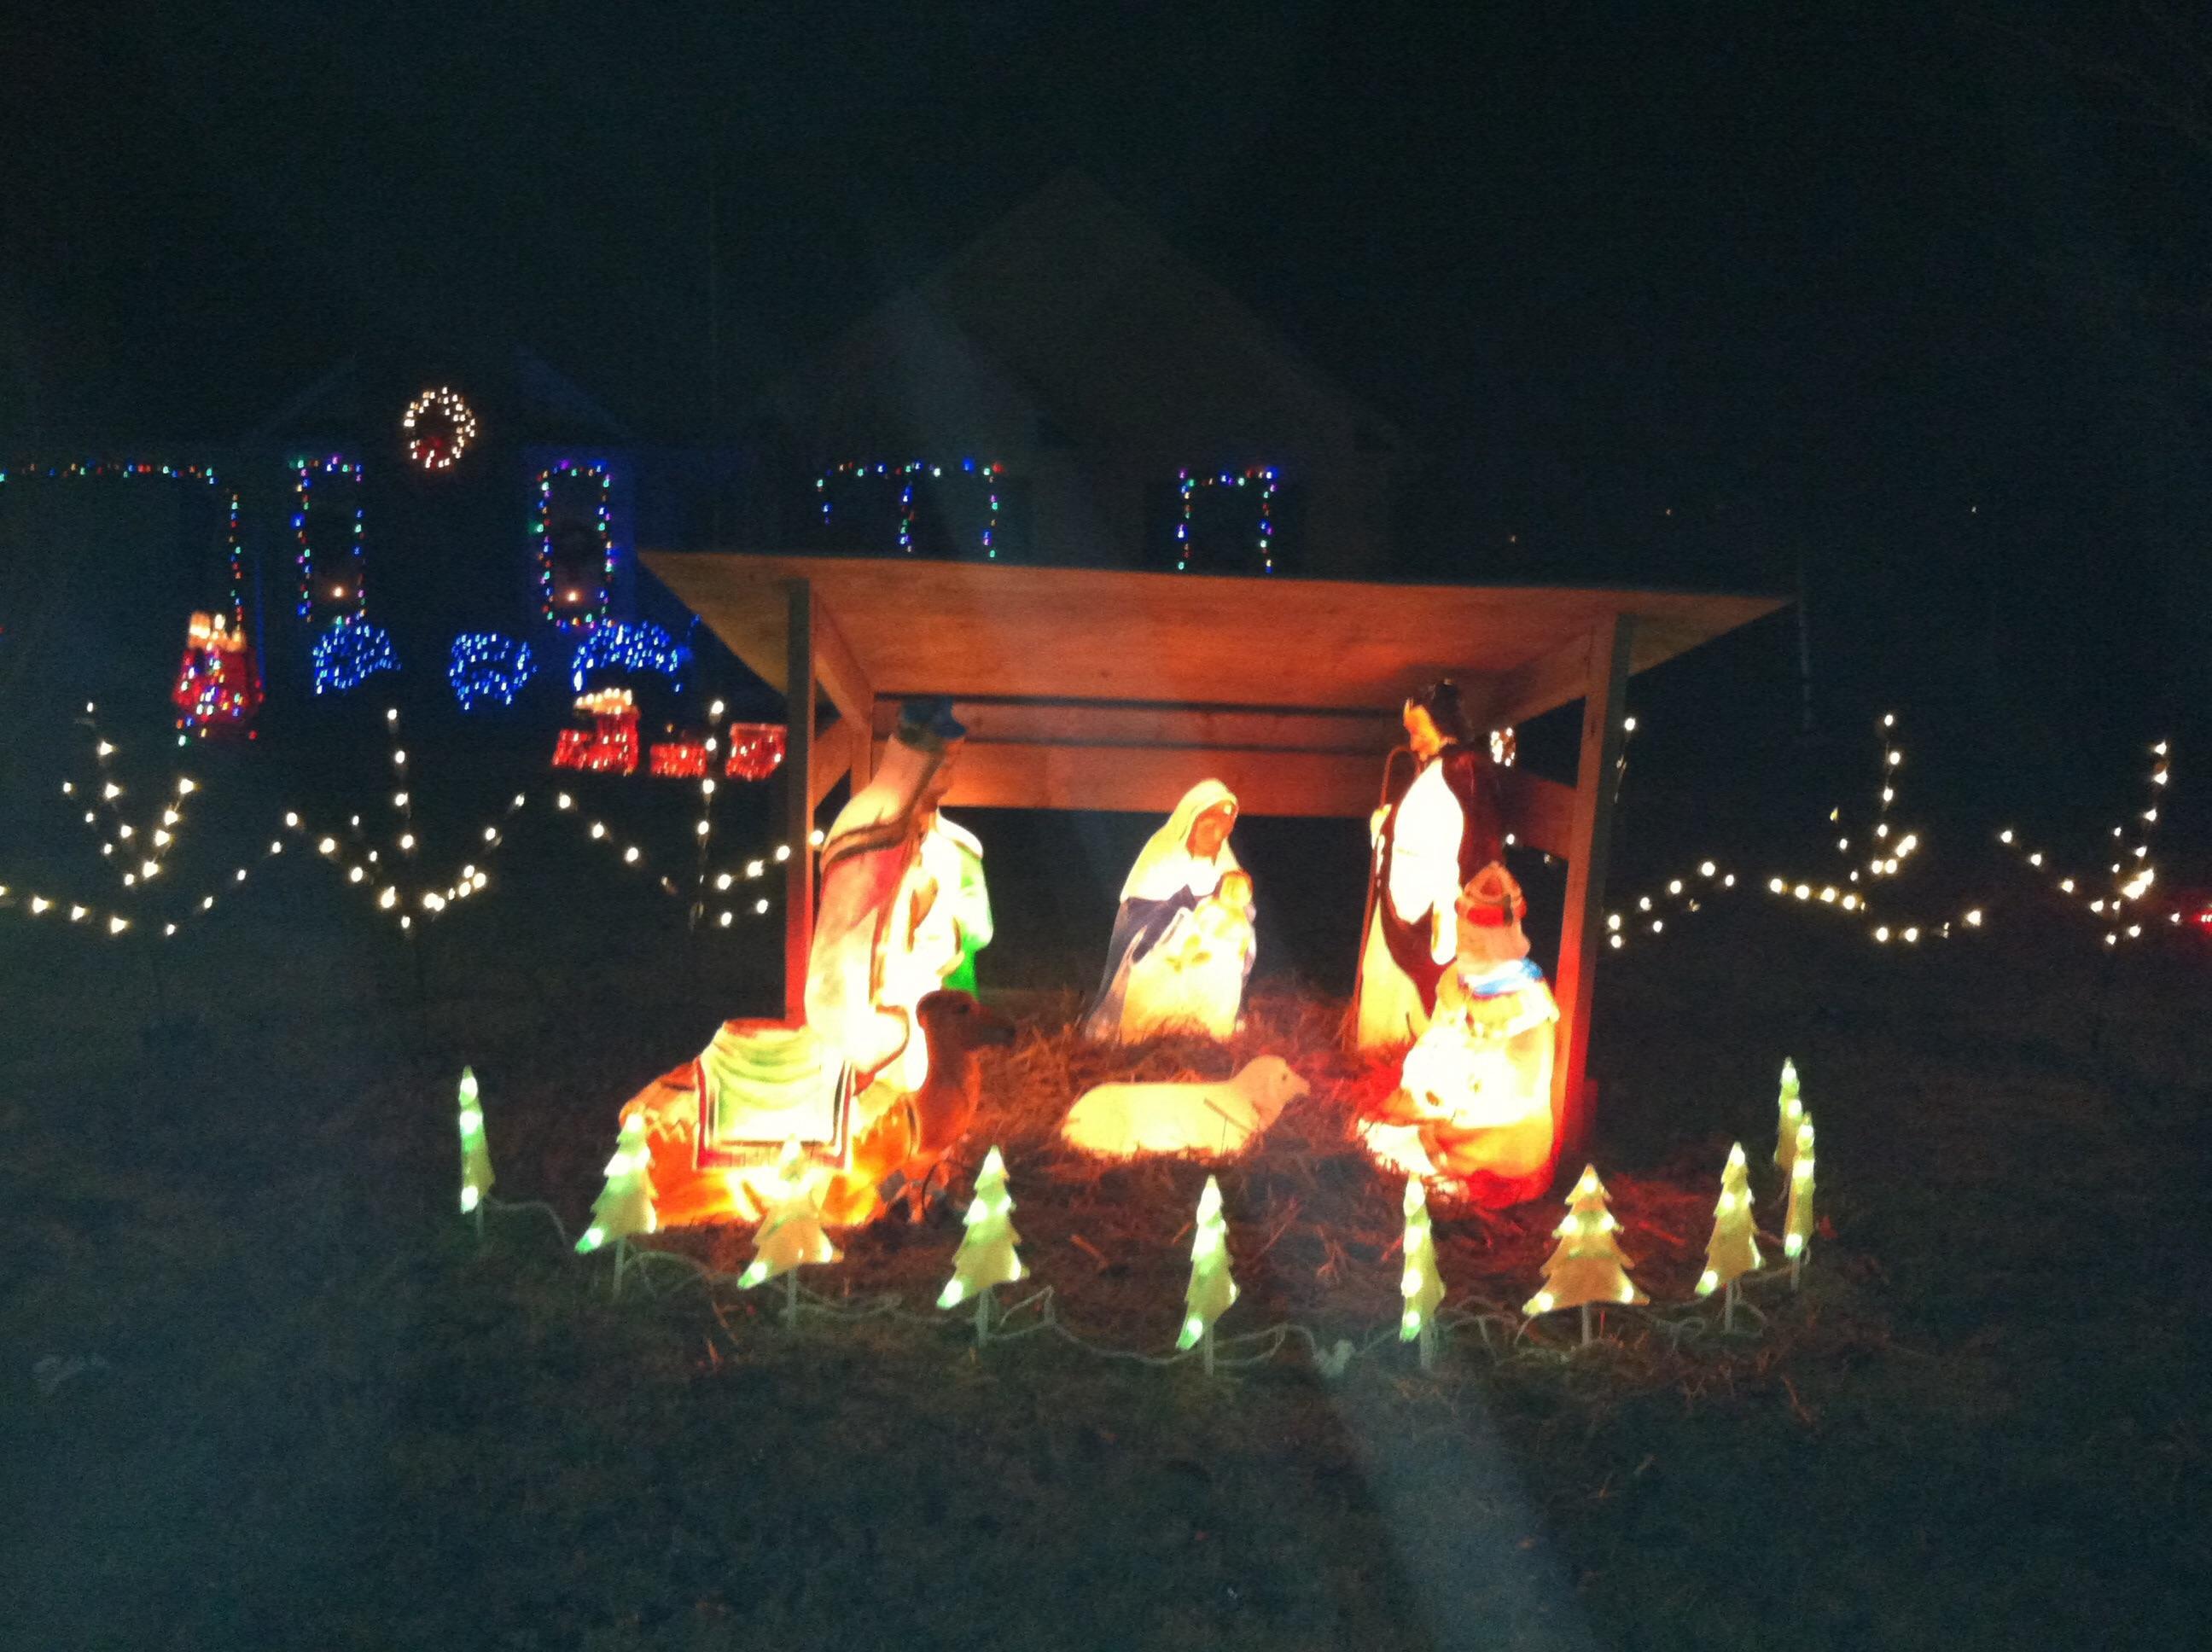 Casville Christmas Lights 2020 Casville Nc Christmas Lights 2020   Vefrnr.happy2020info.site